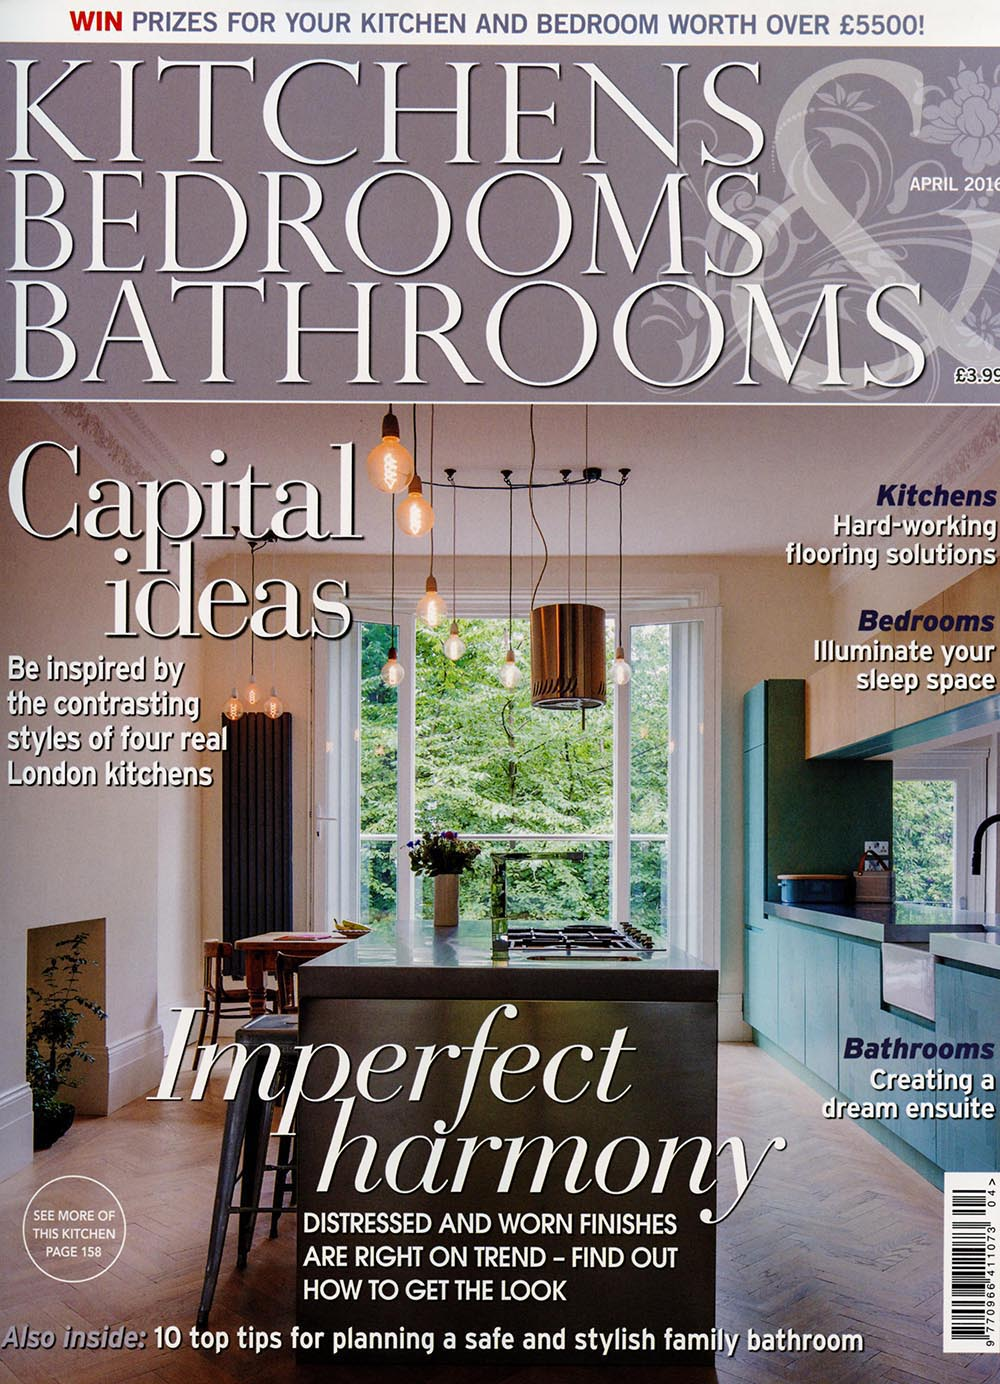 Kitchens Bedroom Bathroom April 2016